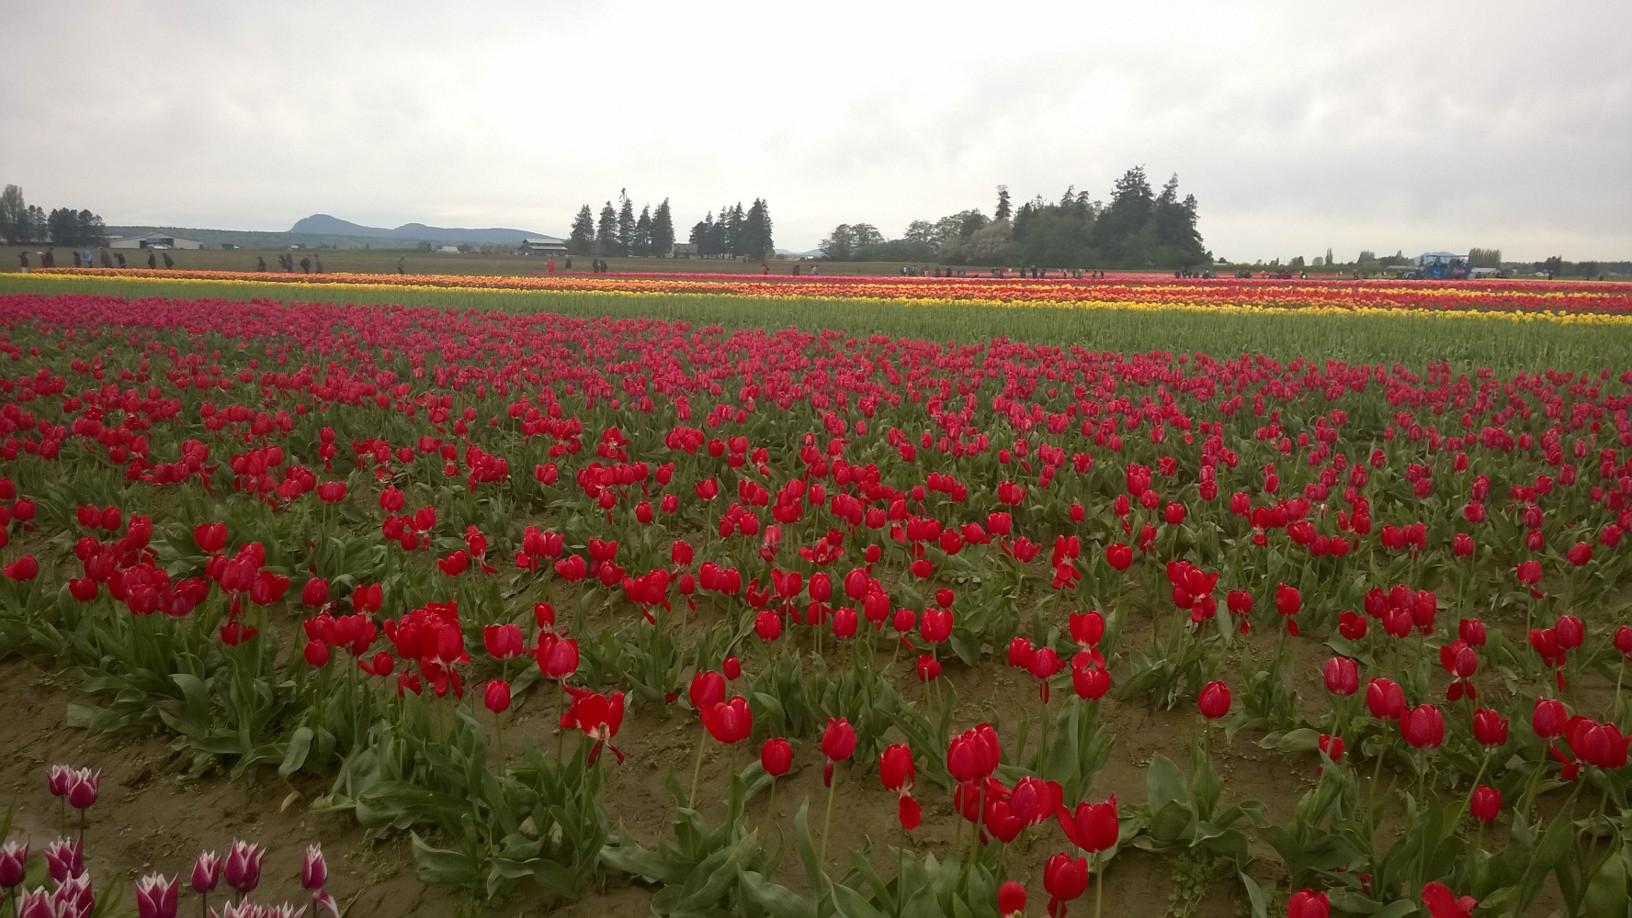 Skagit Valley 斯卡吉特谷: Washington Tulip Festival 華盛頓鬱金香節 ...